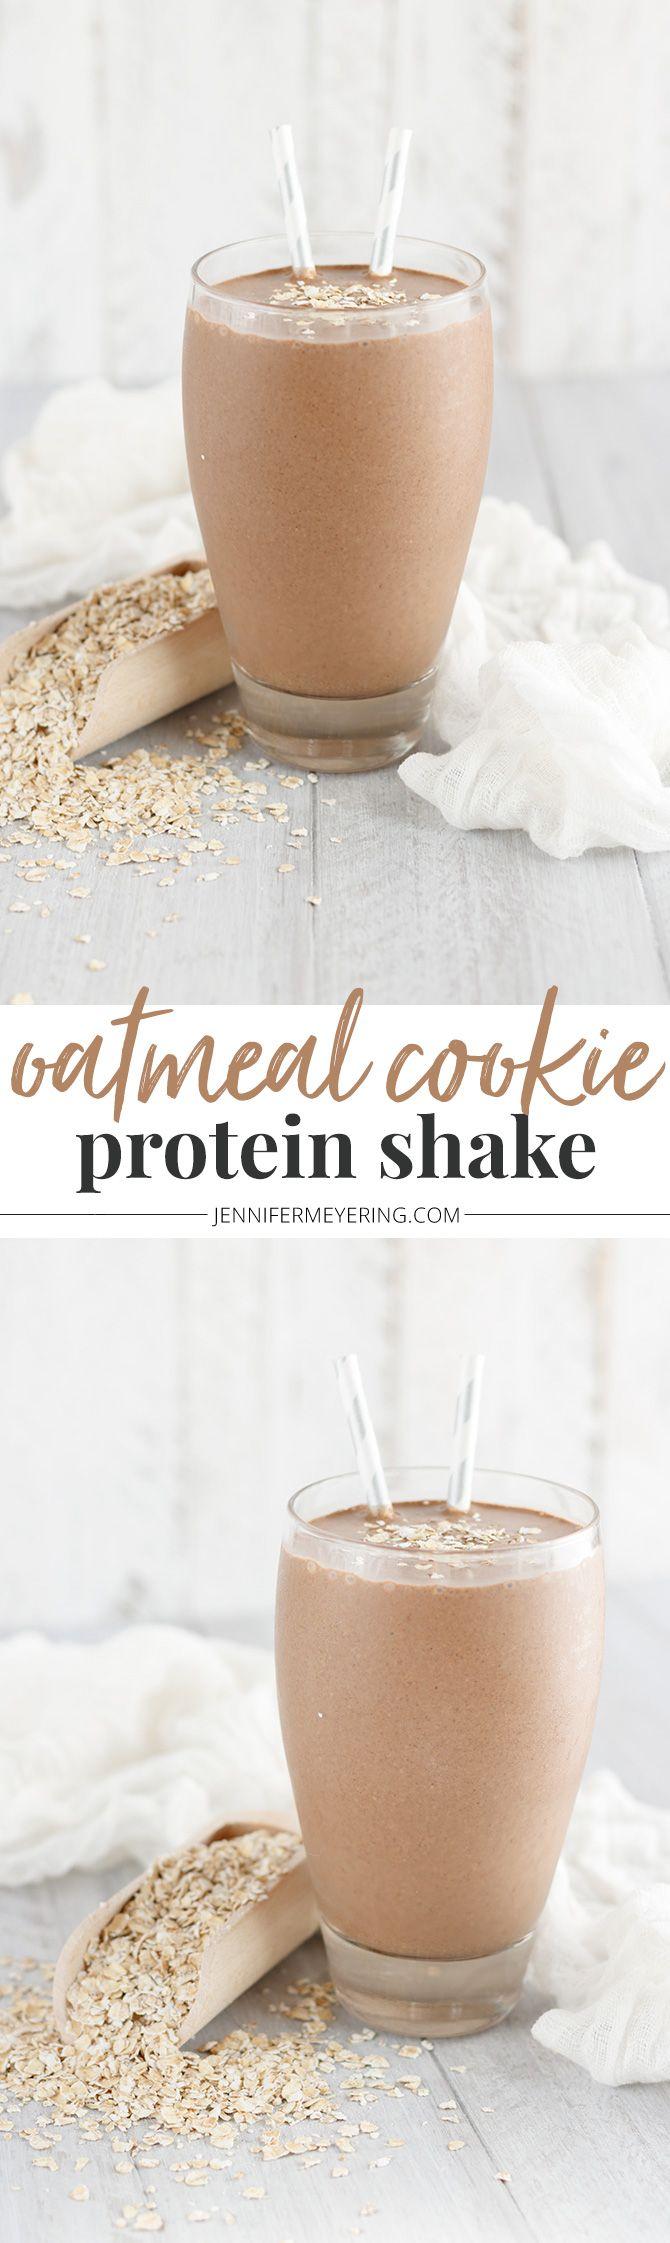 Oatmeal Cookie Protein Shake - JenniferMeyering.com